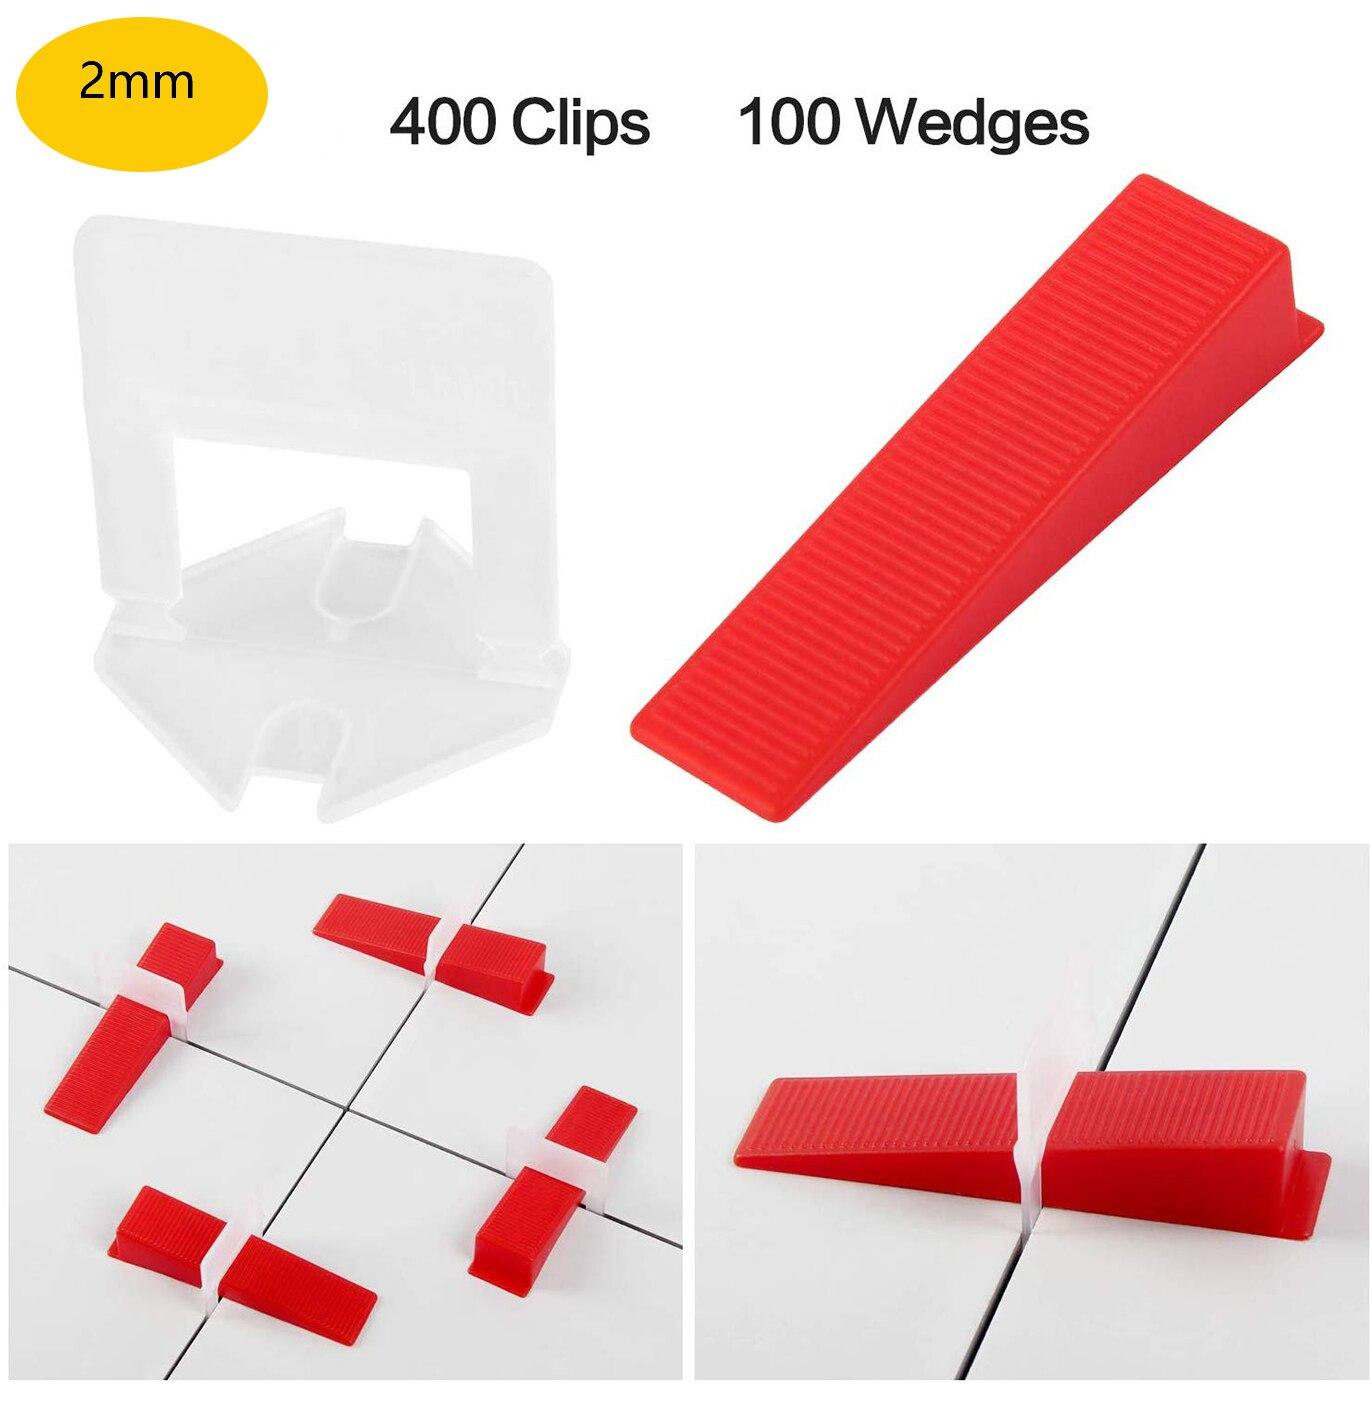 2mm Tile Leveling System 400pcs Clips+100pcs Reusable Wedges Self Leveling Plastic Tile SpacersT Lock For Floor Wall Ceramics